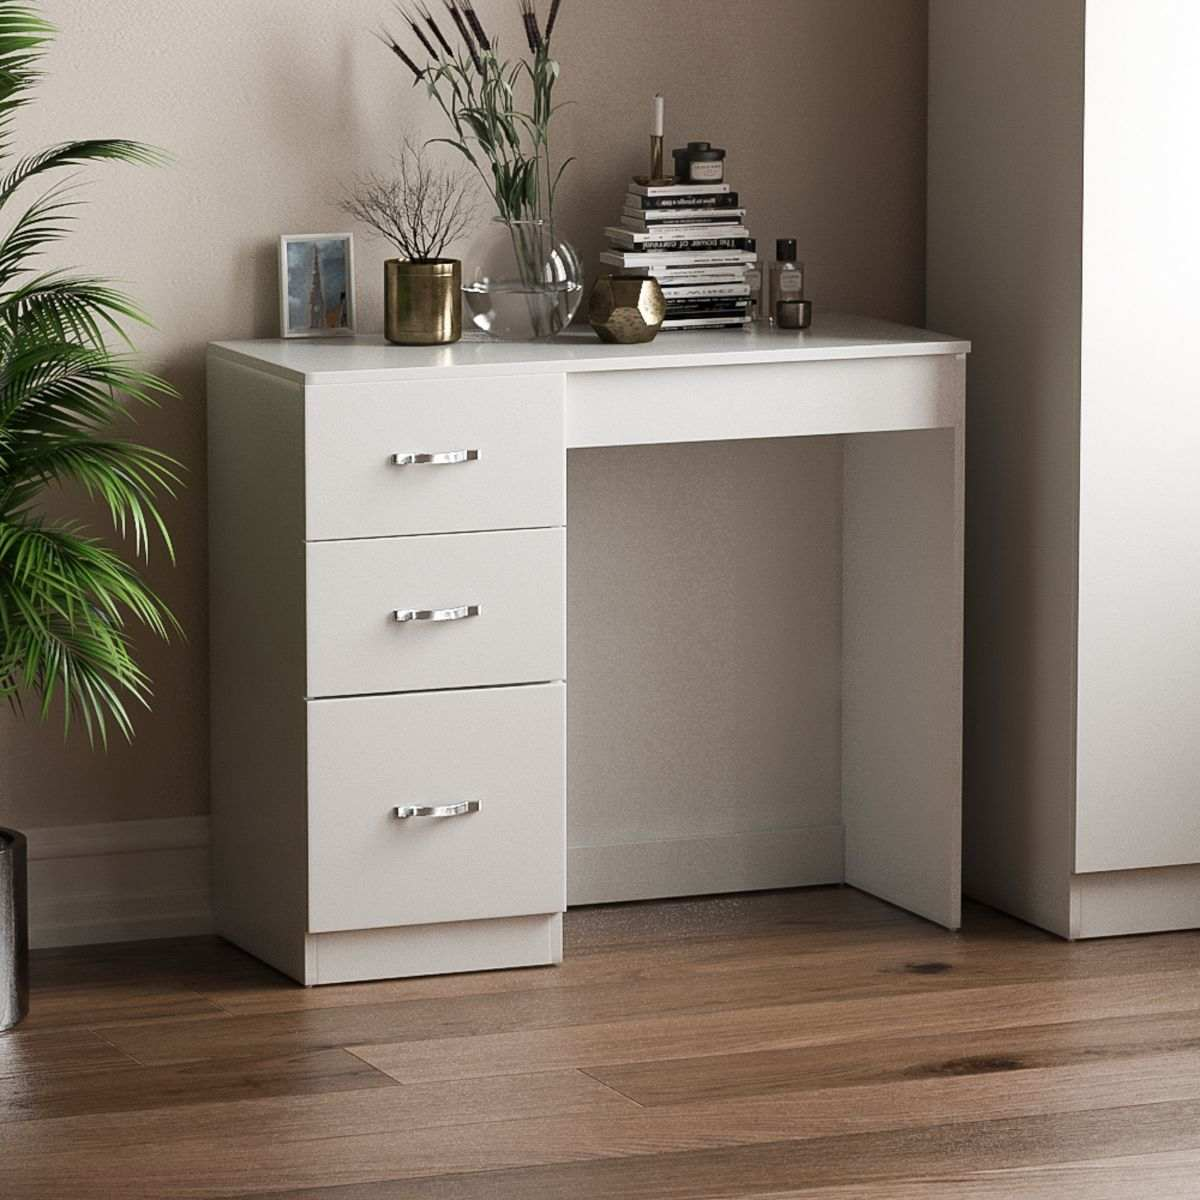 Vida Designs Riano Dressing Table, White